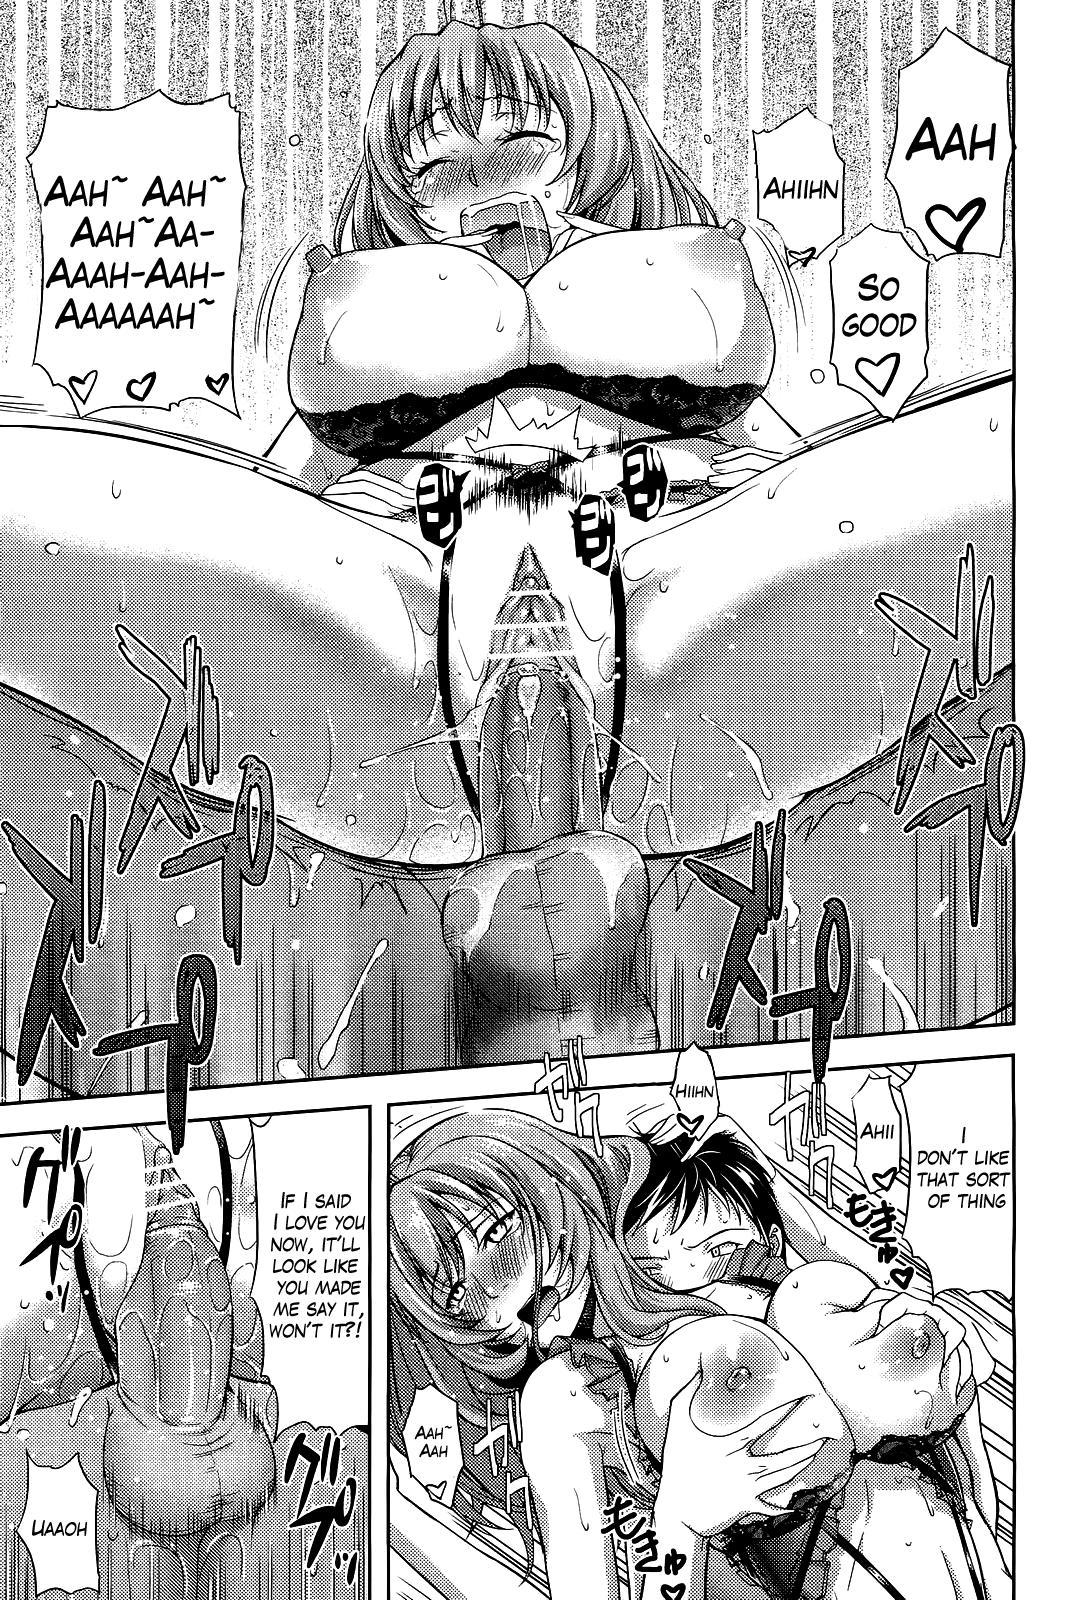 Otona no Anemone 16